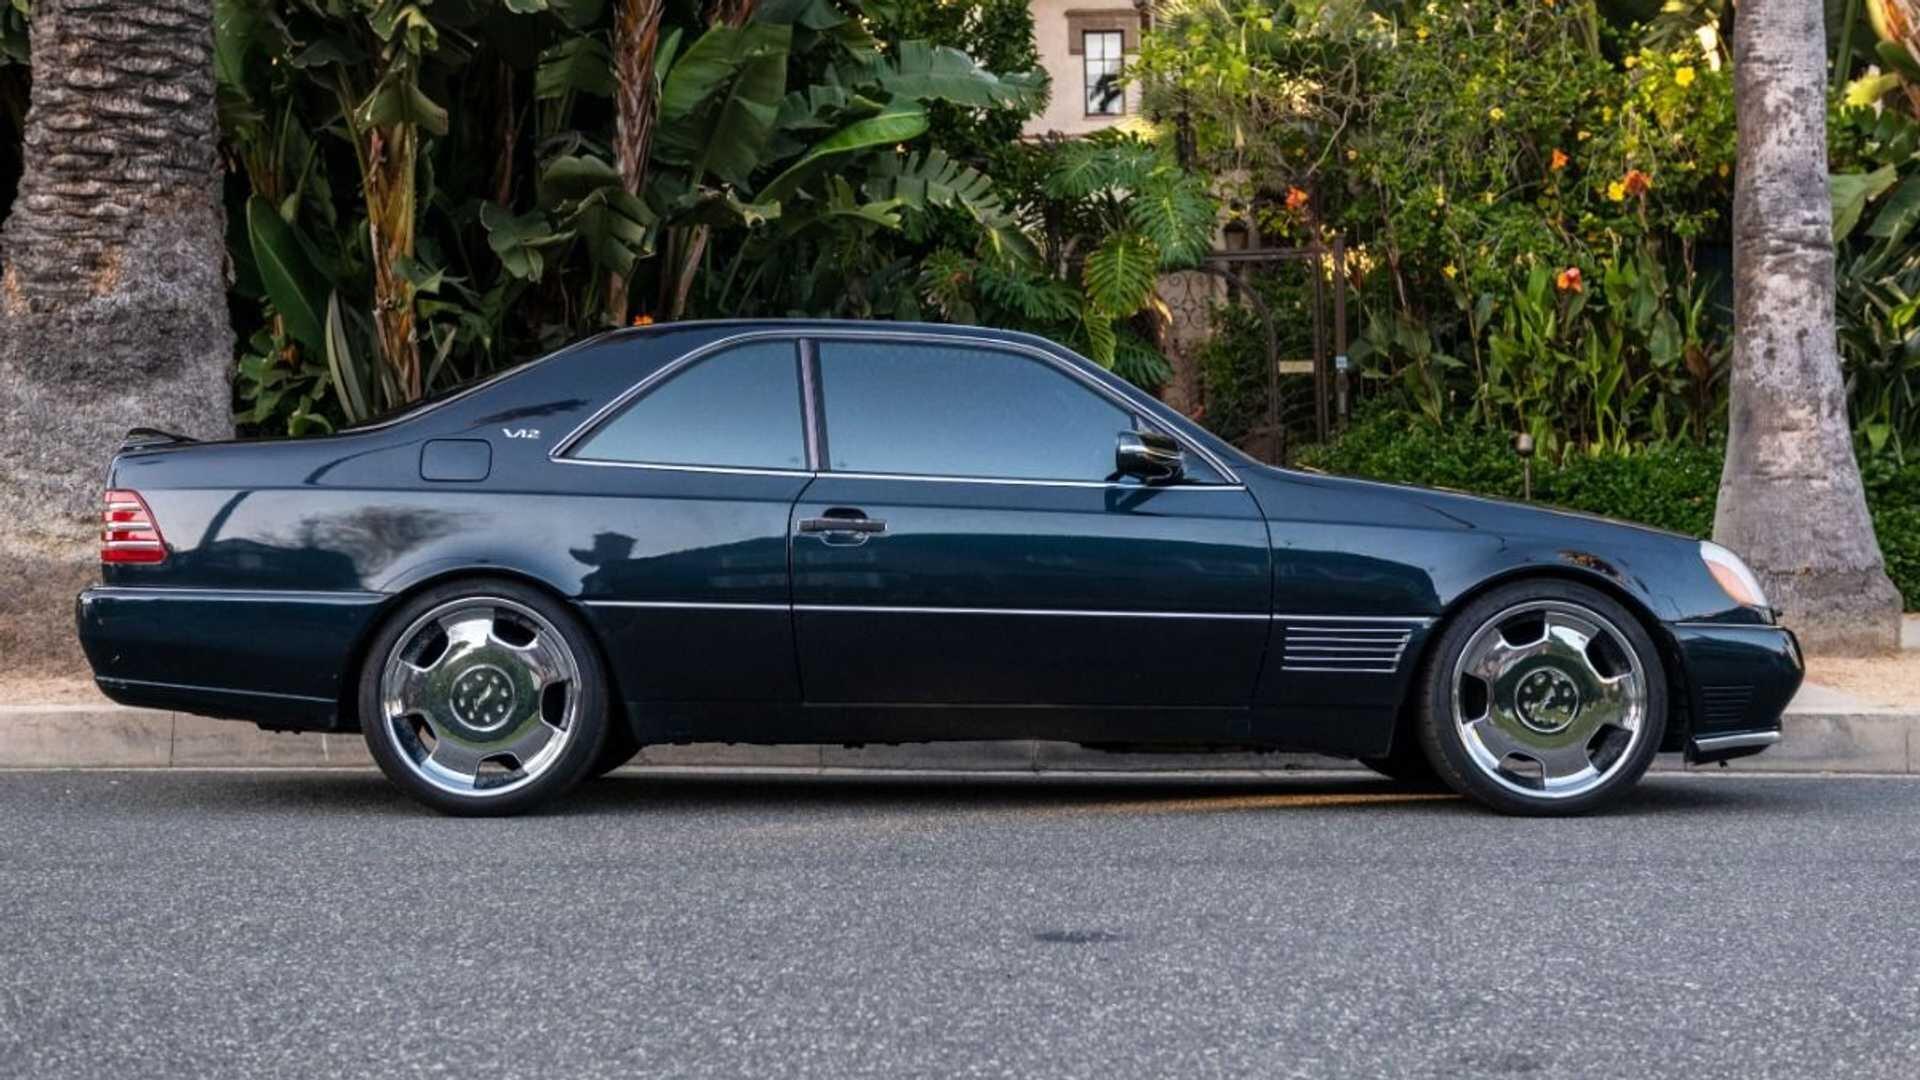 Mercedes-Benz S600 С140 Майкла Джордана